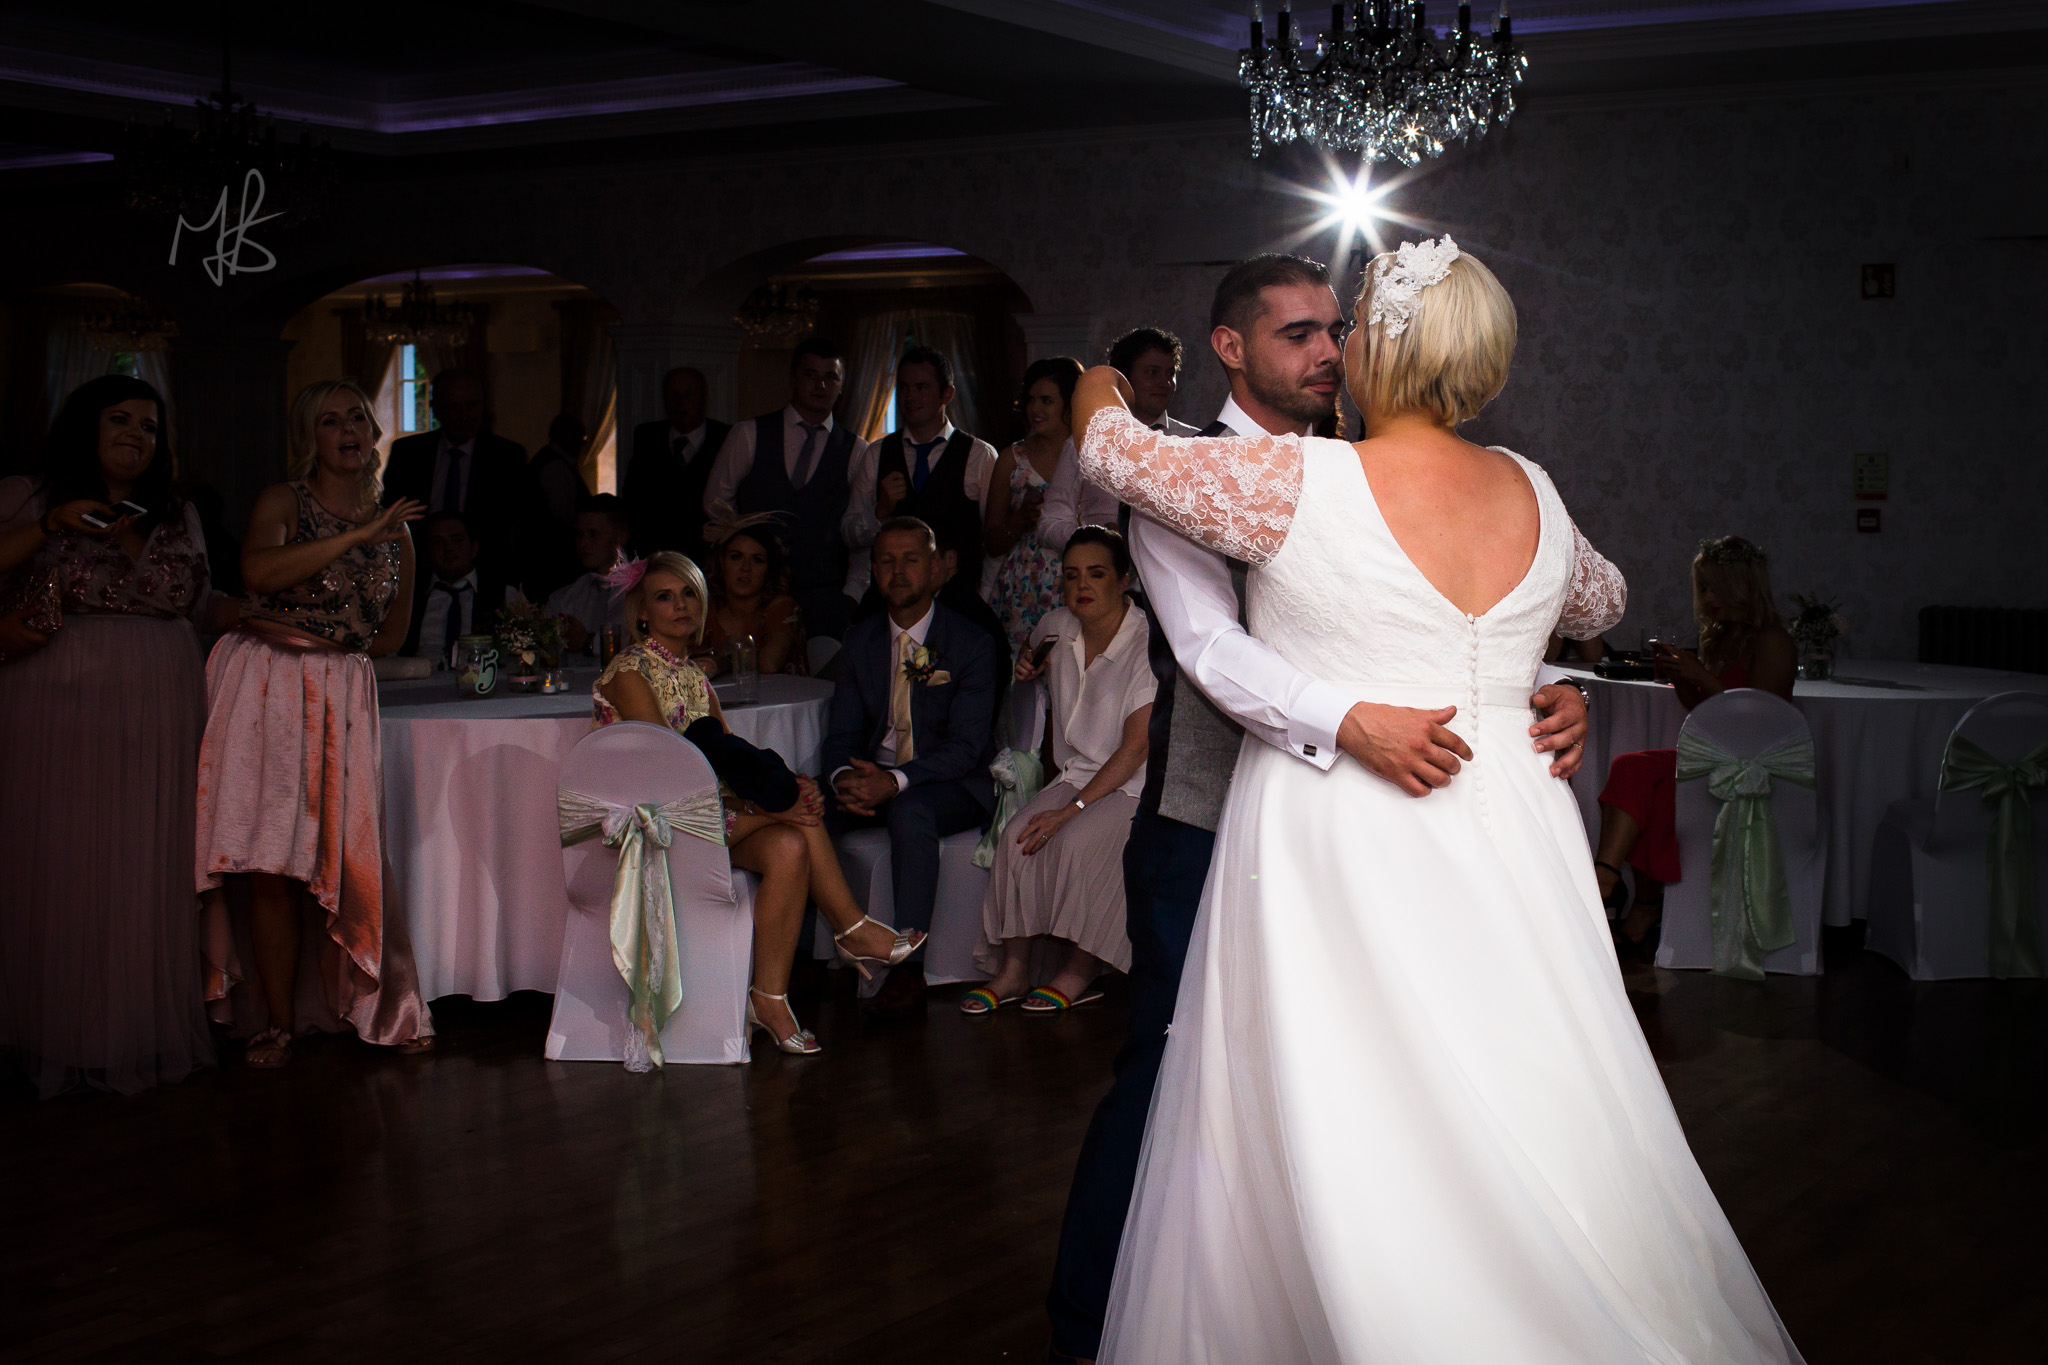 Northern-Ireland-Wedding-Photographer-Mark-Barnes-Ballymena_wedding-photography-Leighinmohr-House-Seamas_Alanna_For-web-51.jpg